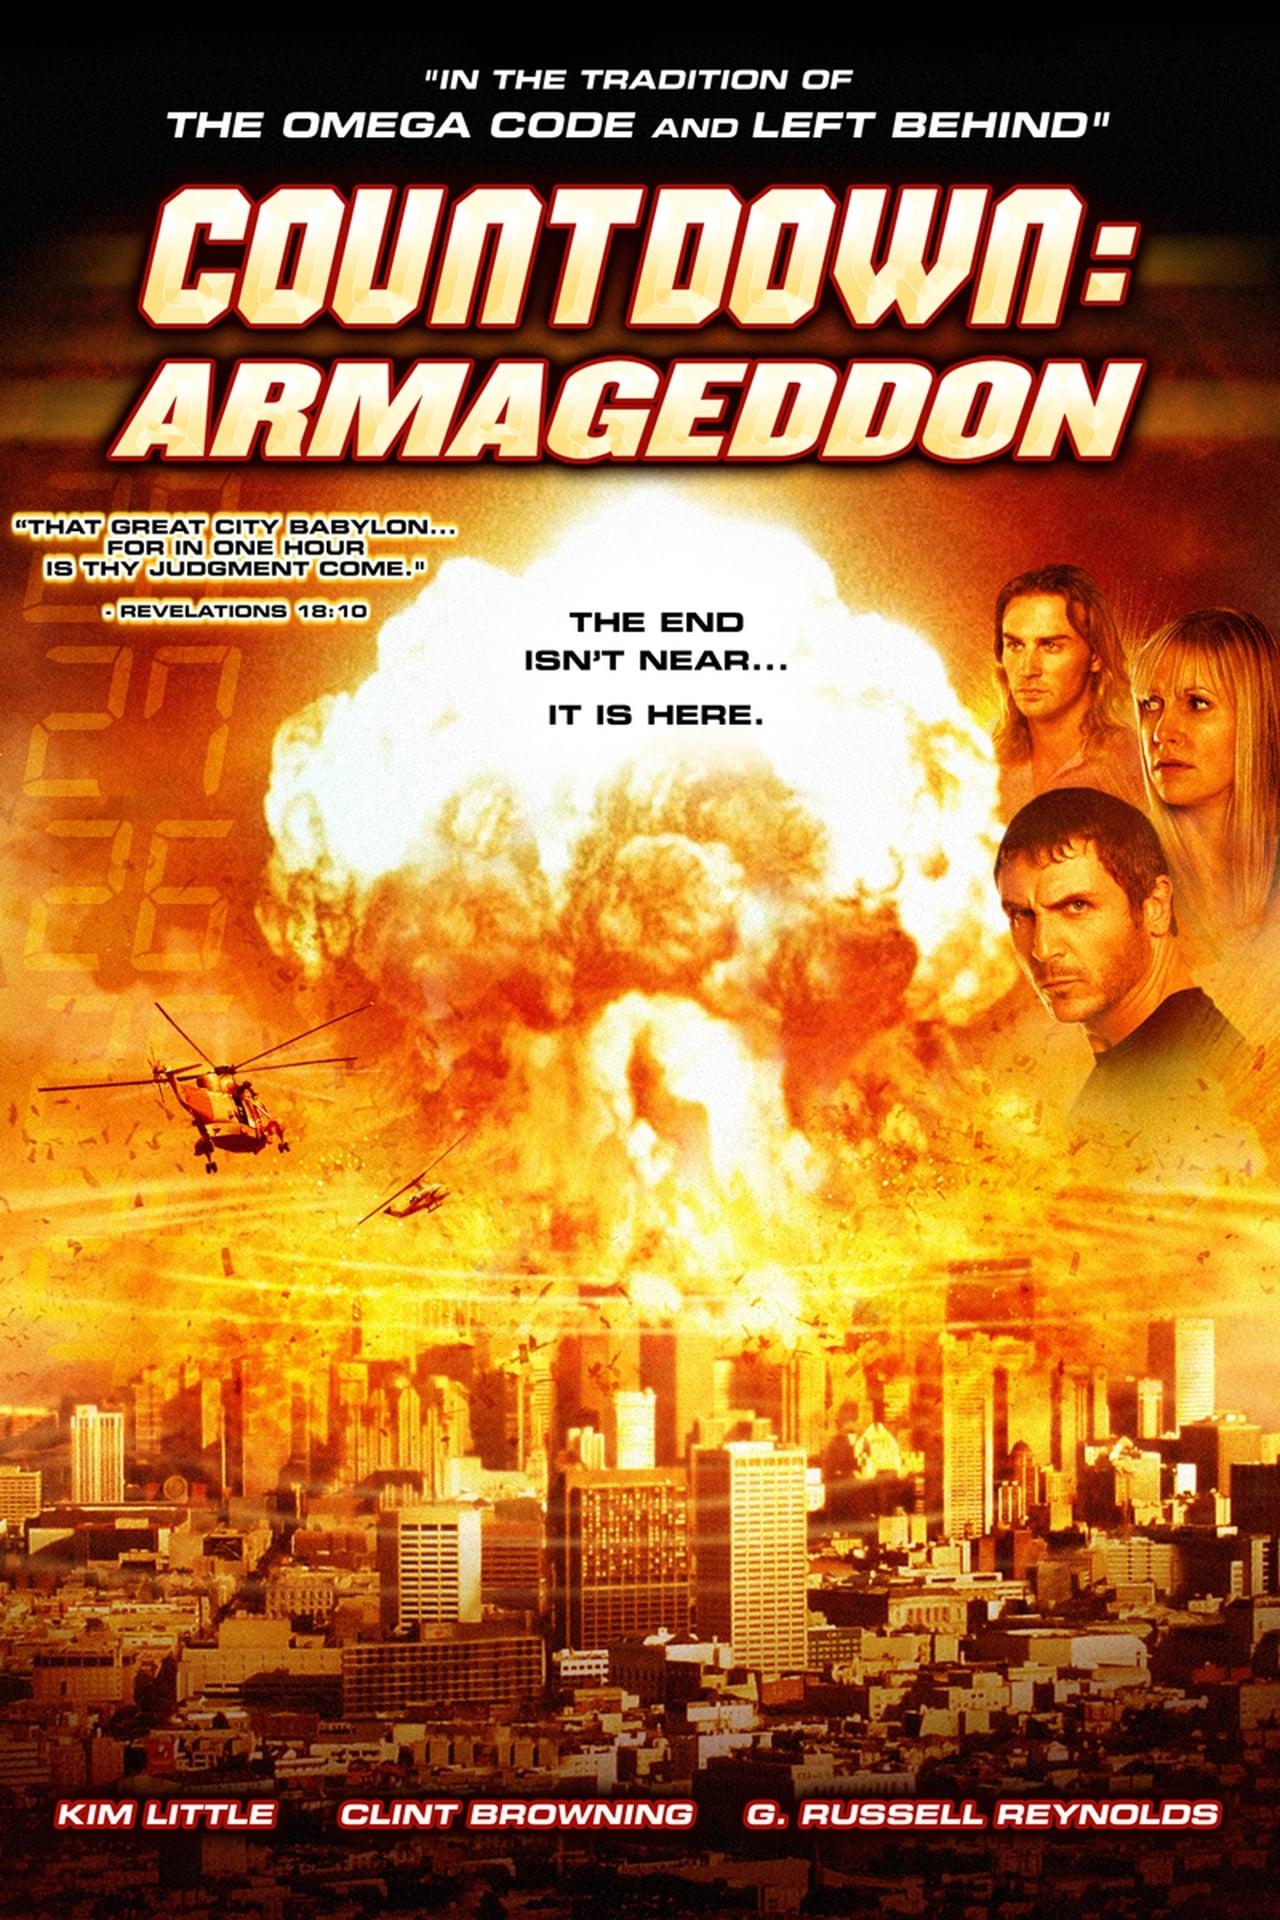 Countdown: Armageddon (2009)